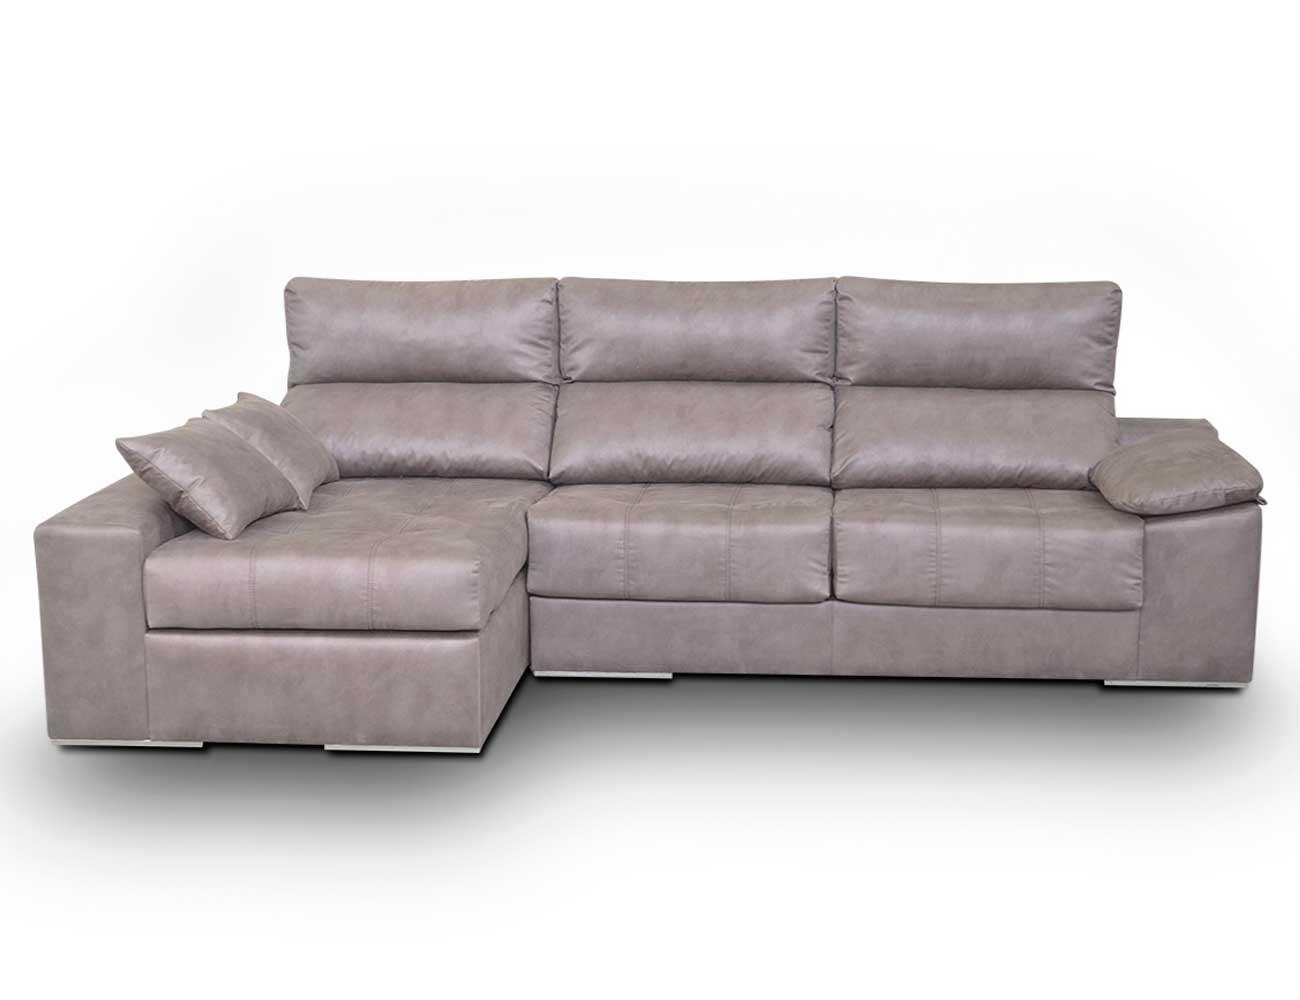 4938_sofa chaiselongue moderno asientos extraibles muy comodo dobles pespuntes donatella8